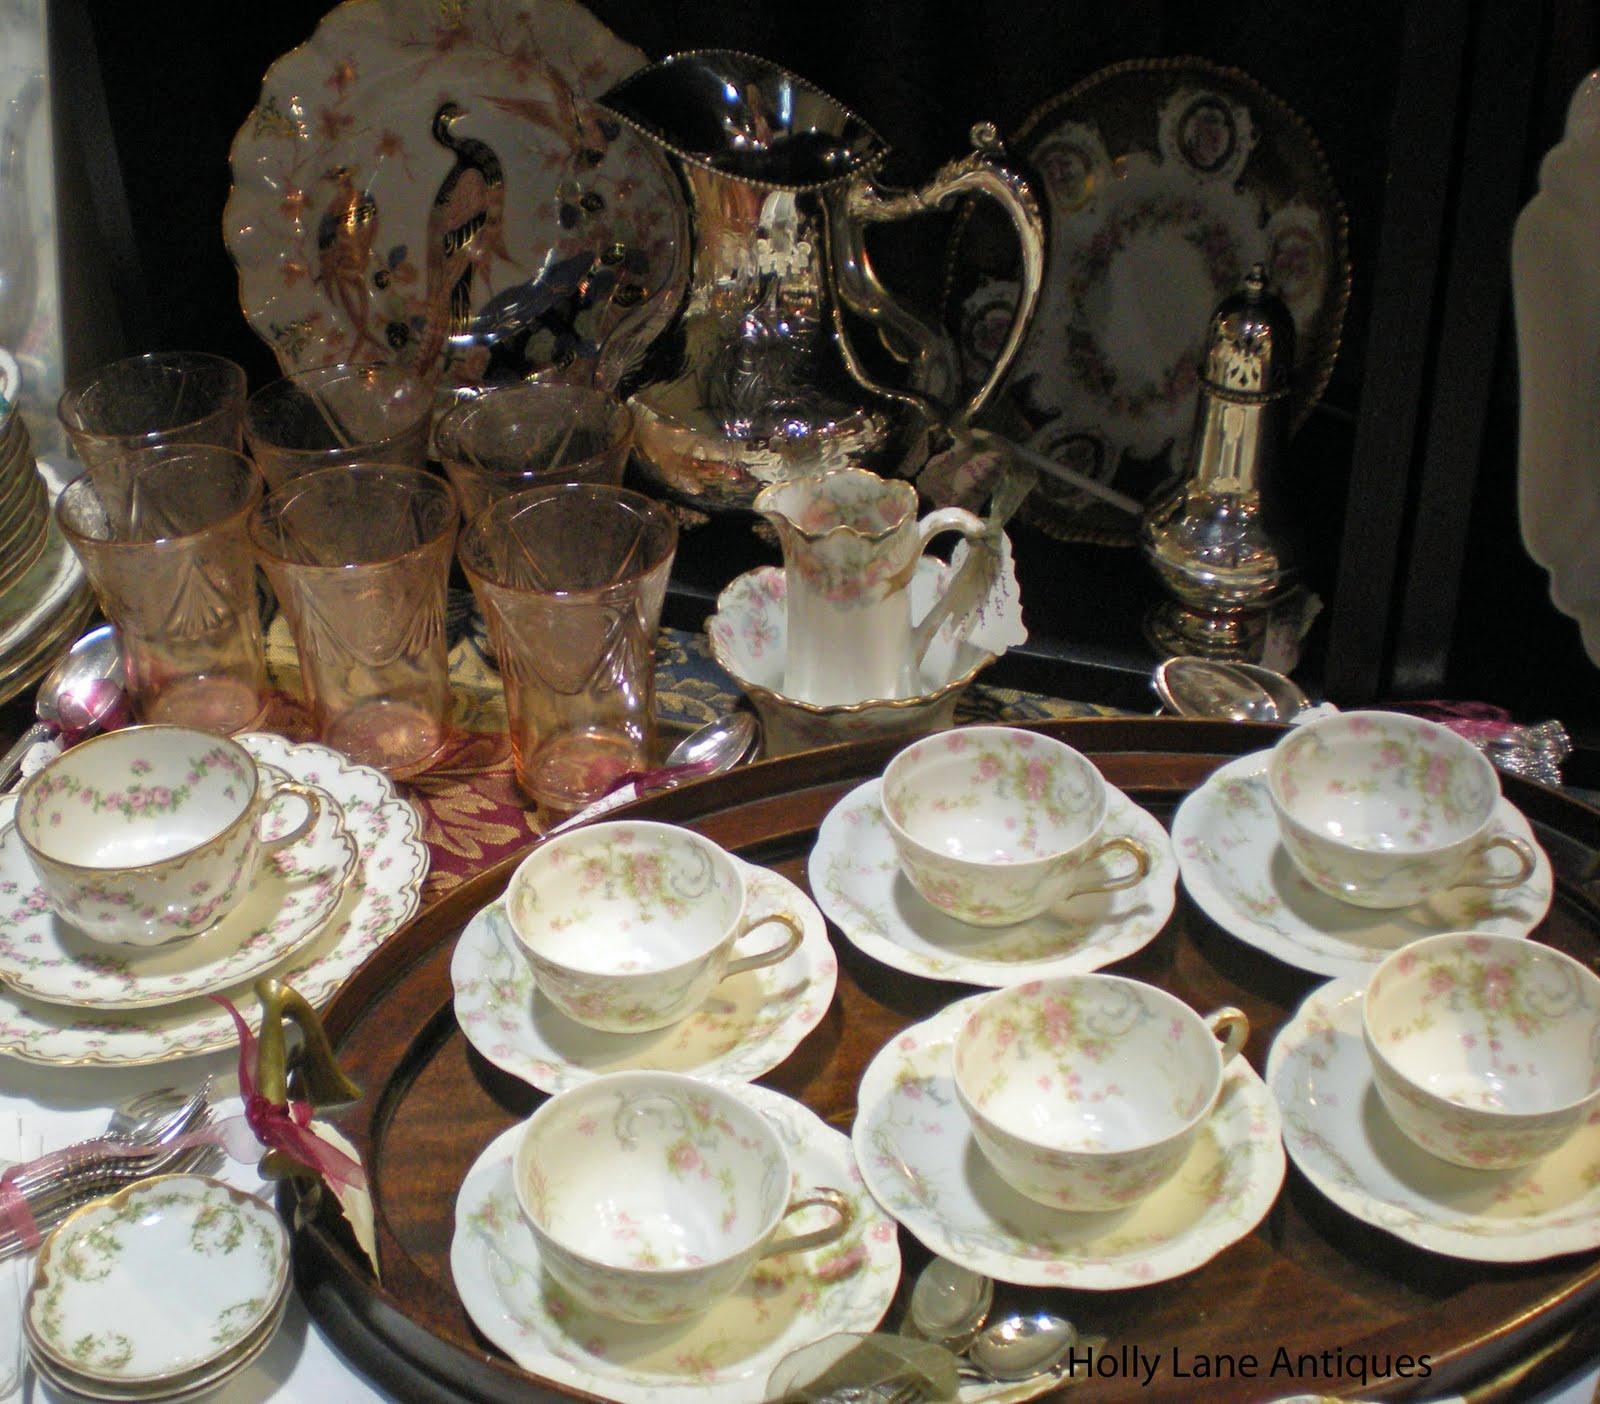 Holly Lane Antiques: Holiday Shopping At Holly Lane